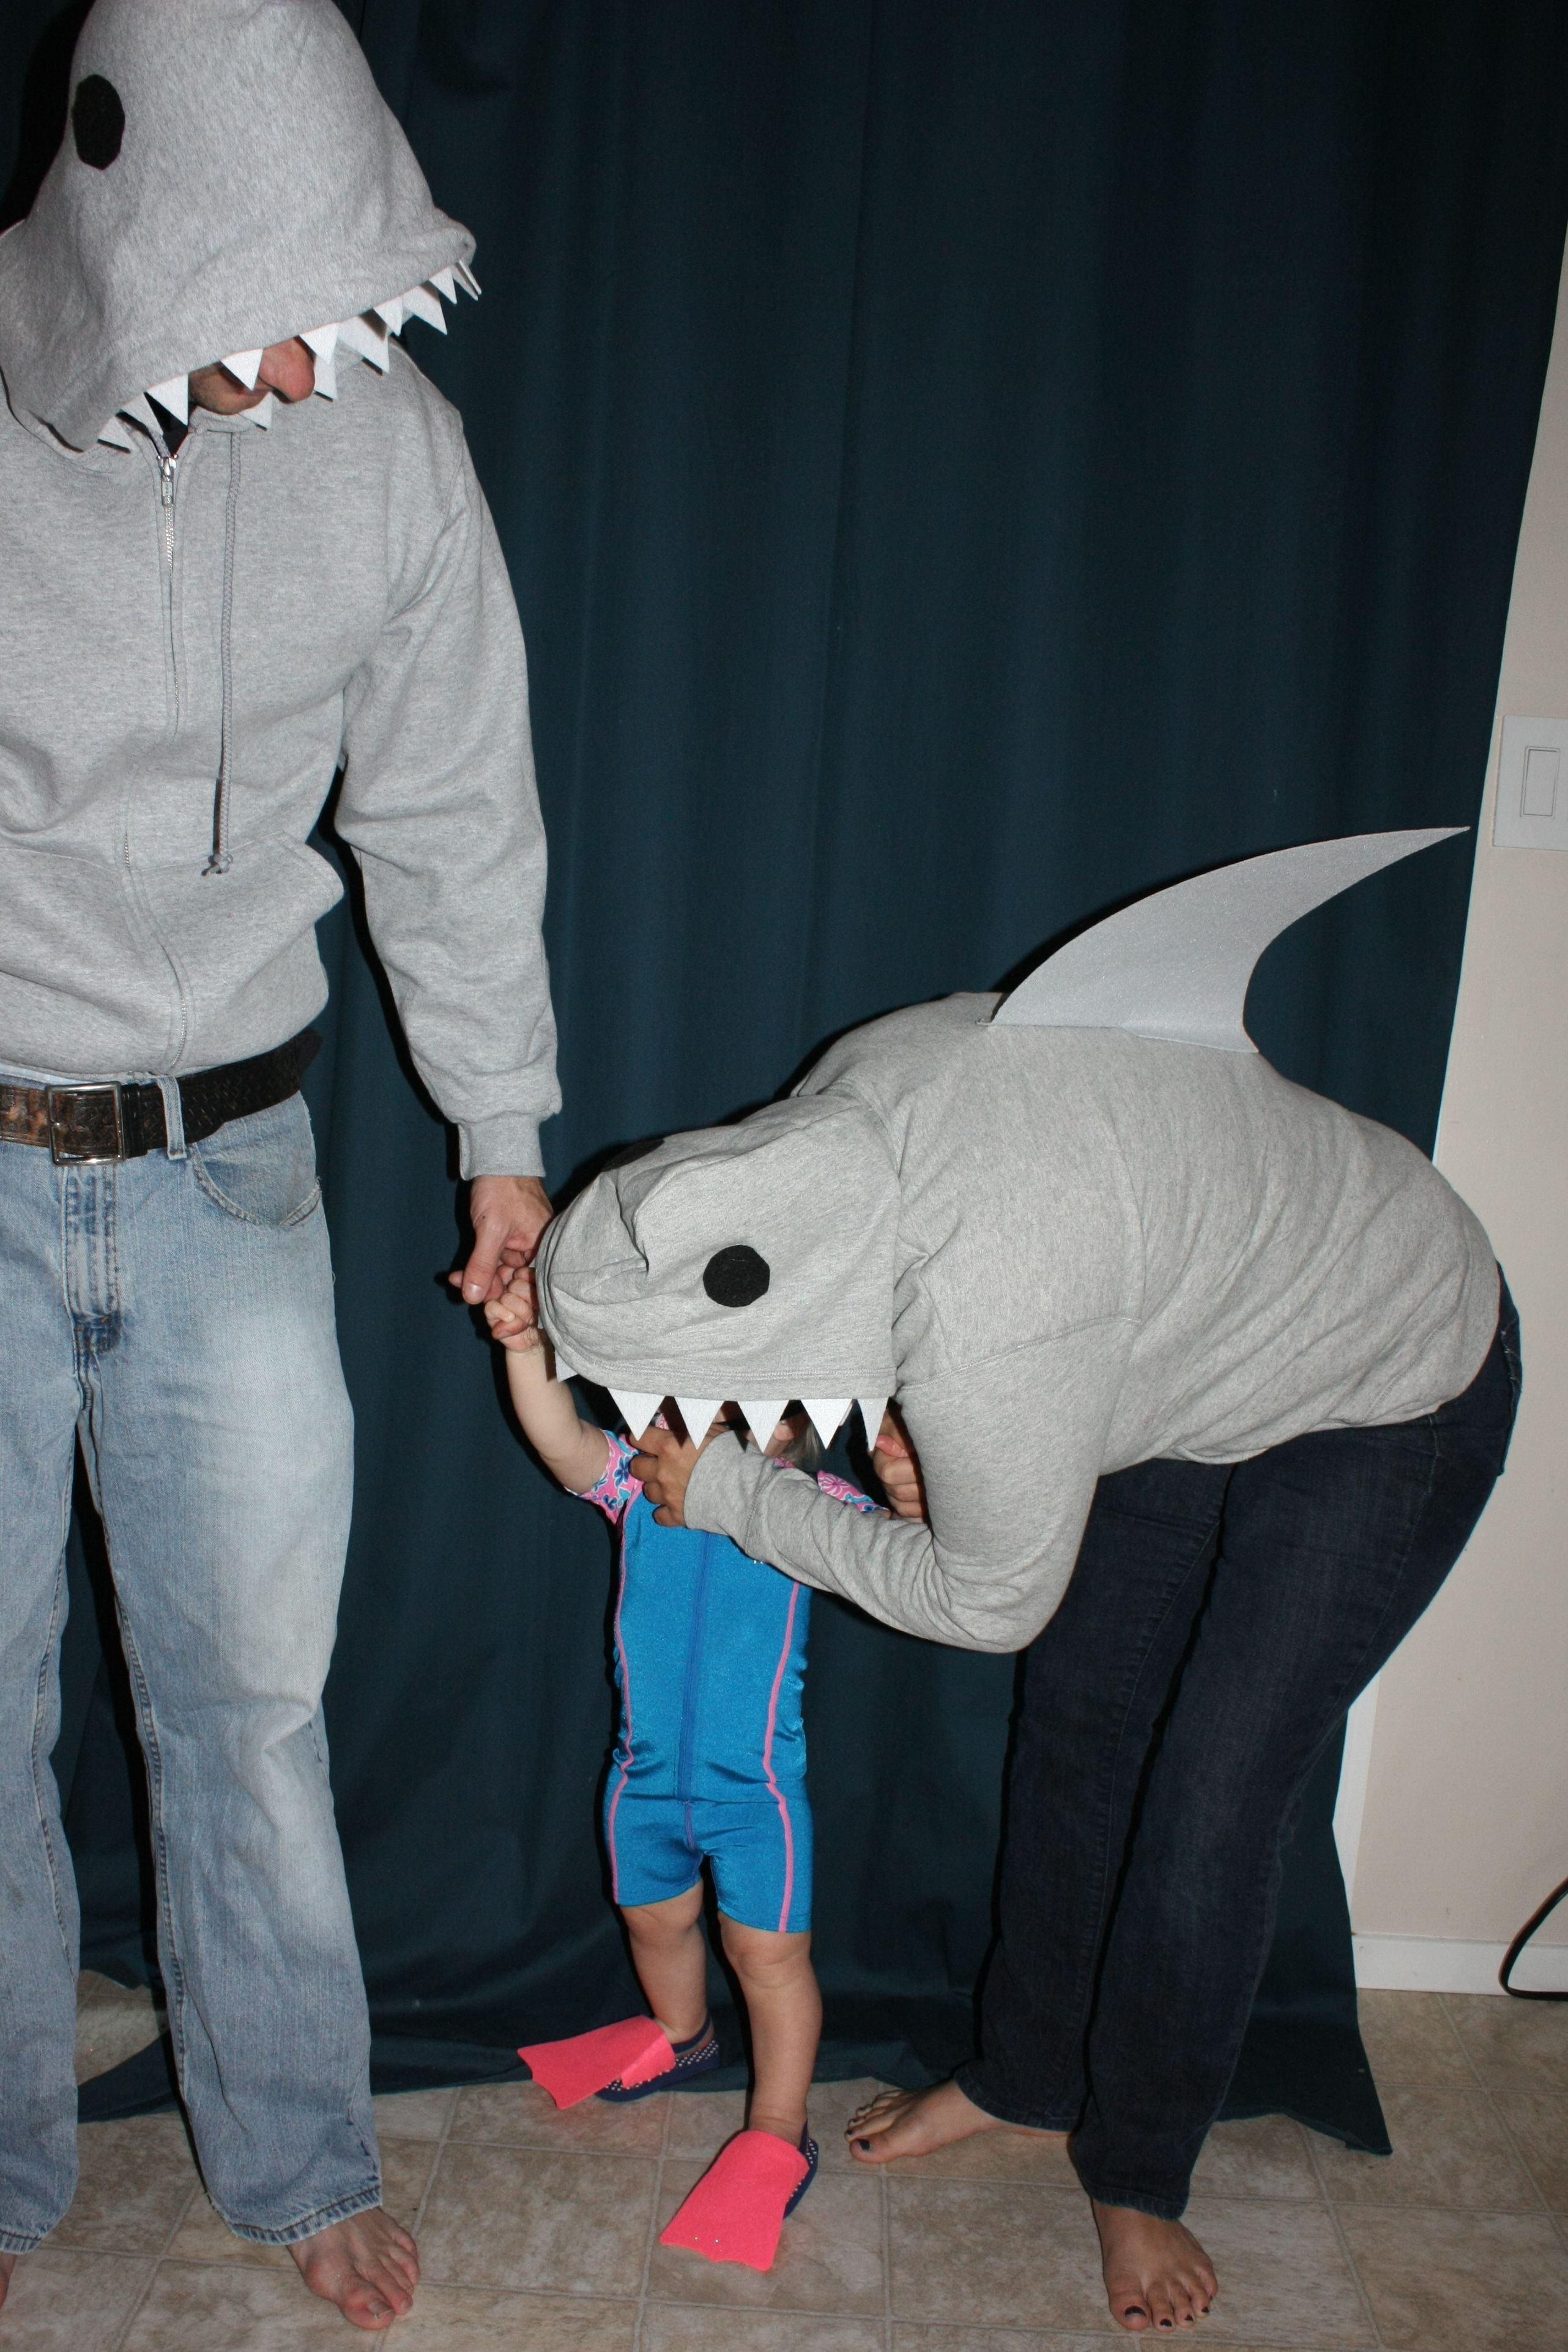 Shark and Scuba Costume | DIY | Shark costumes, Family ...